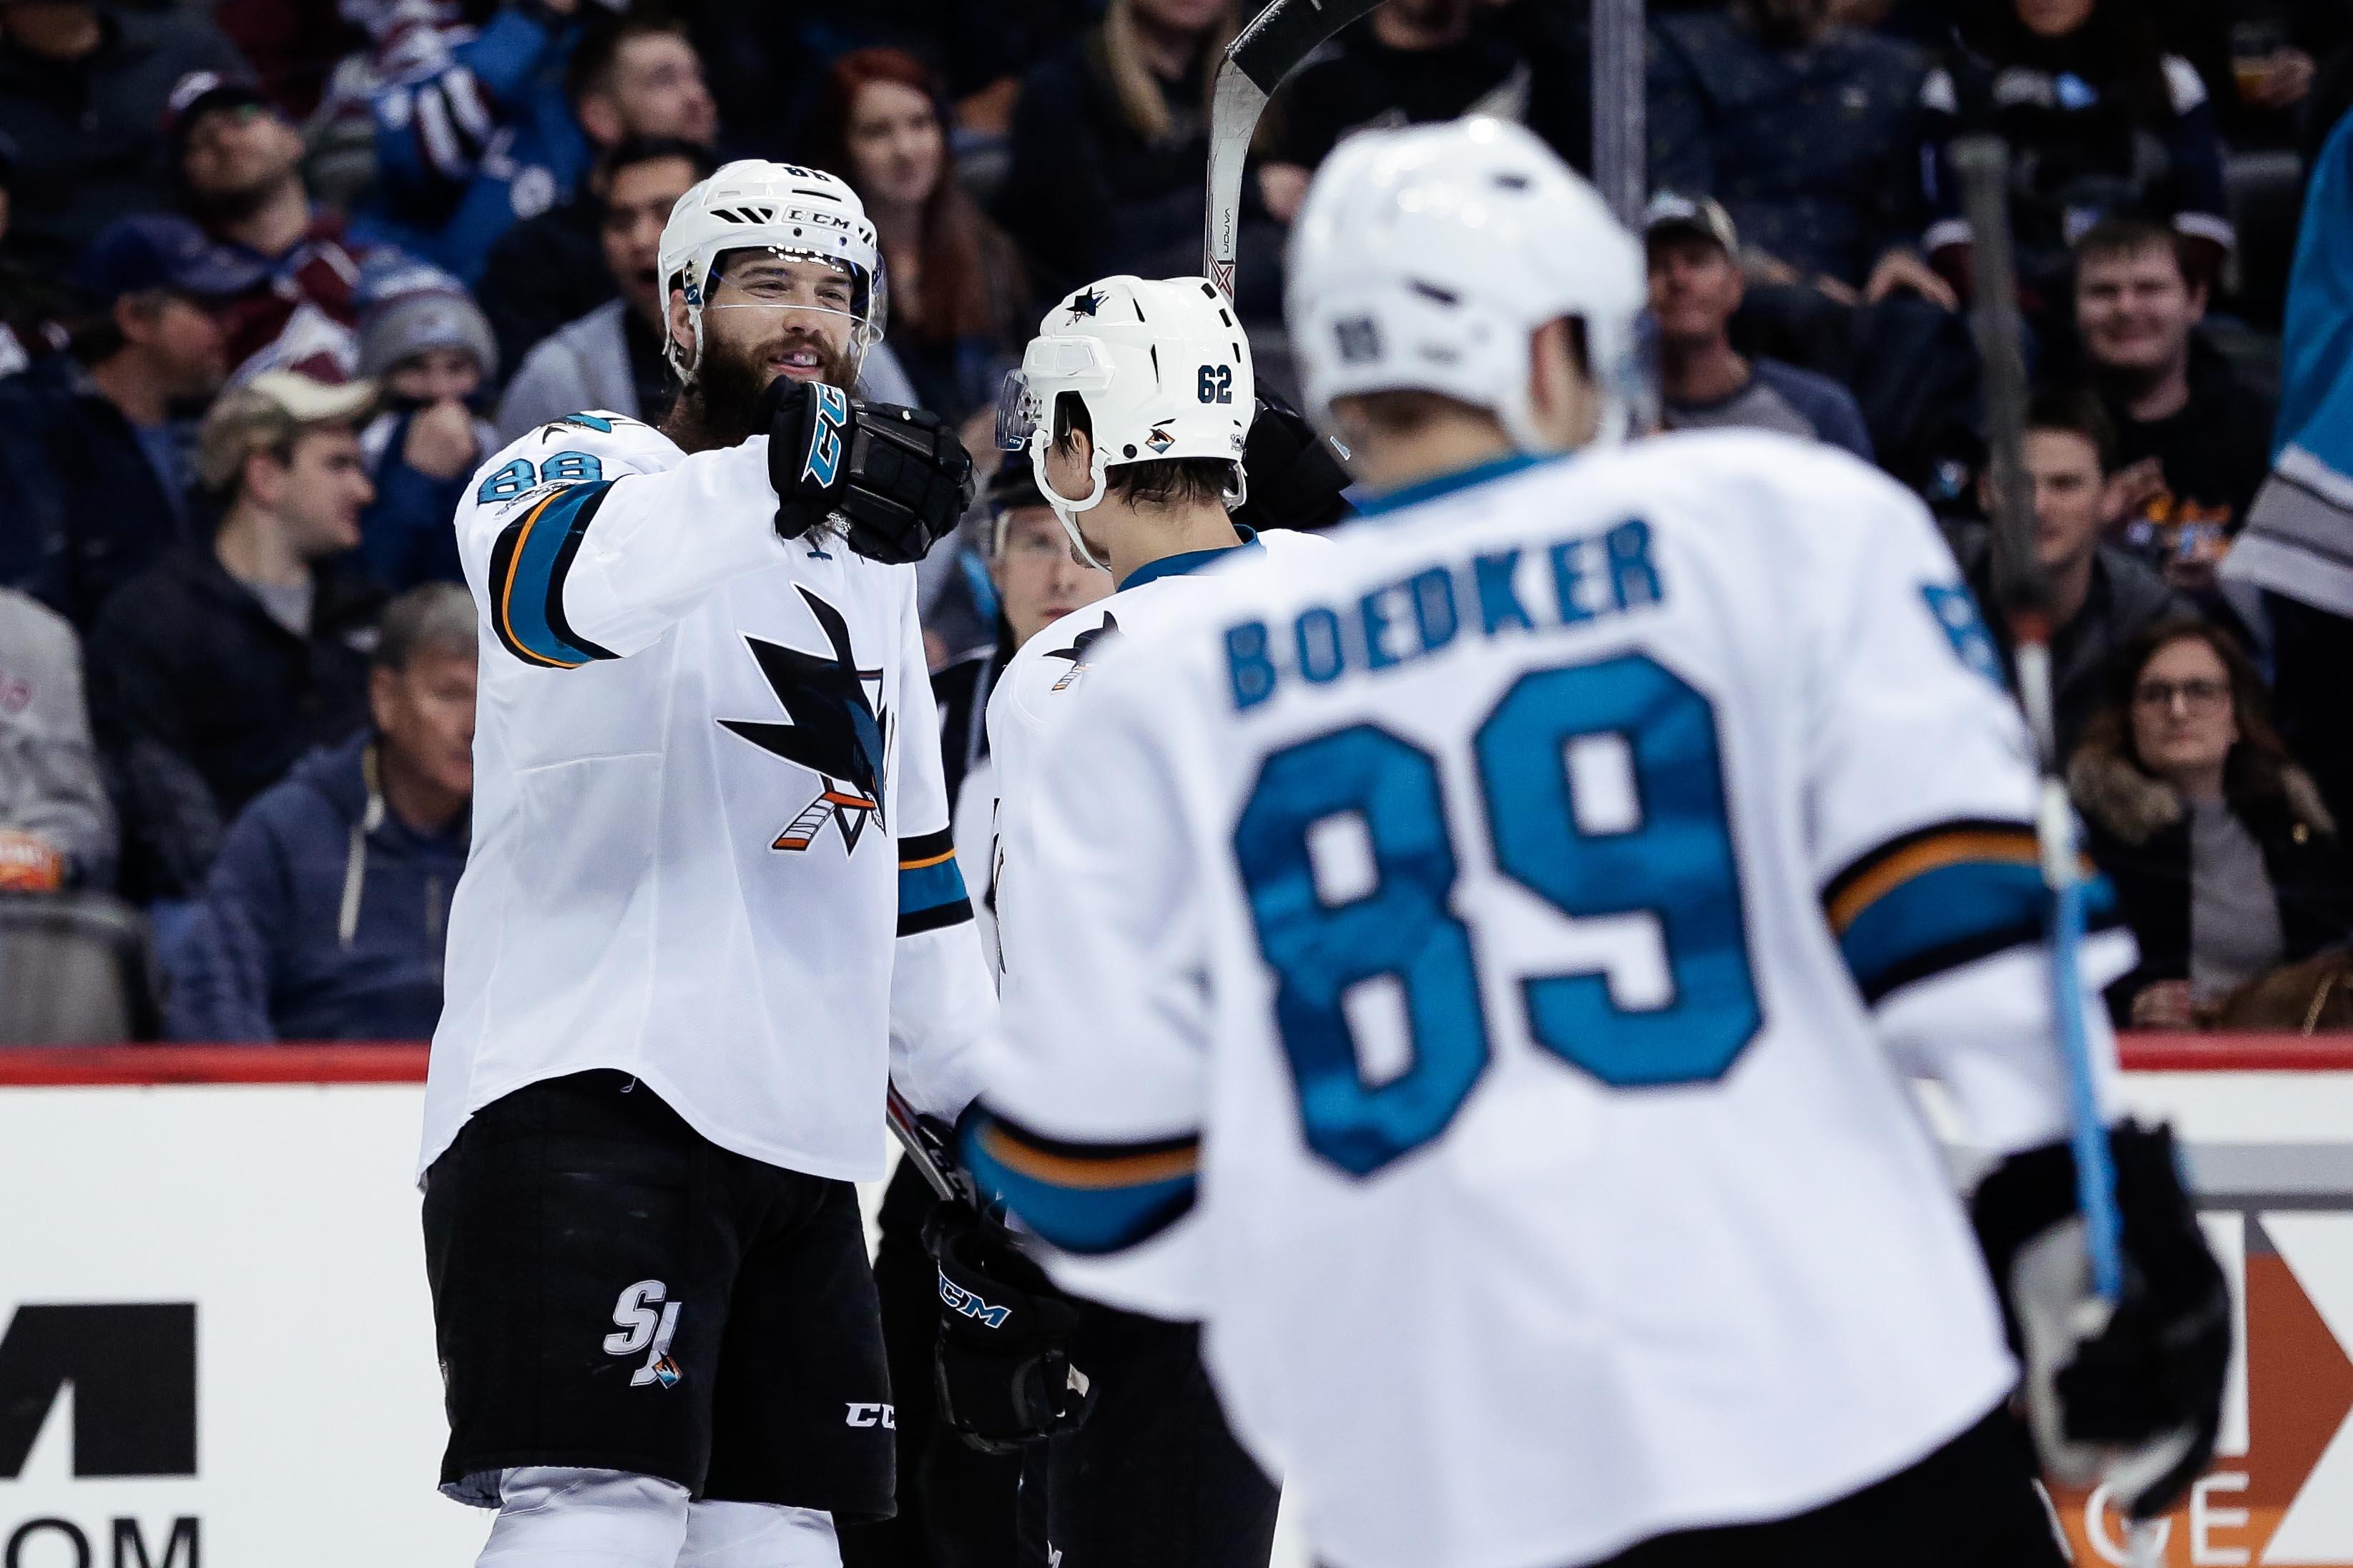 NHL: San Jose Sharks at Colorado Avalanche